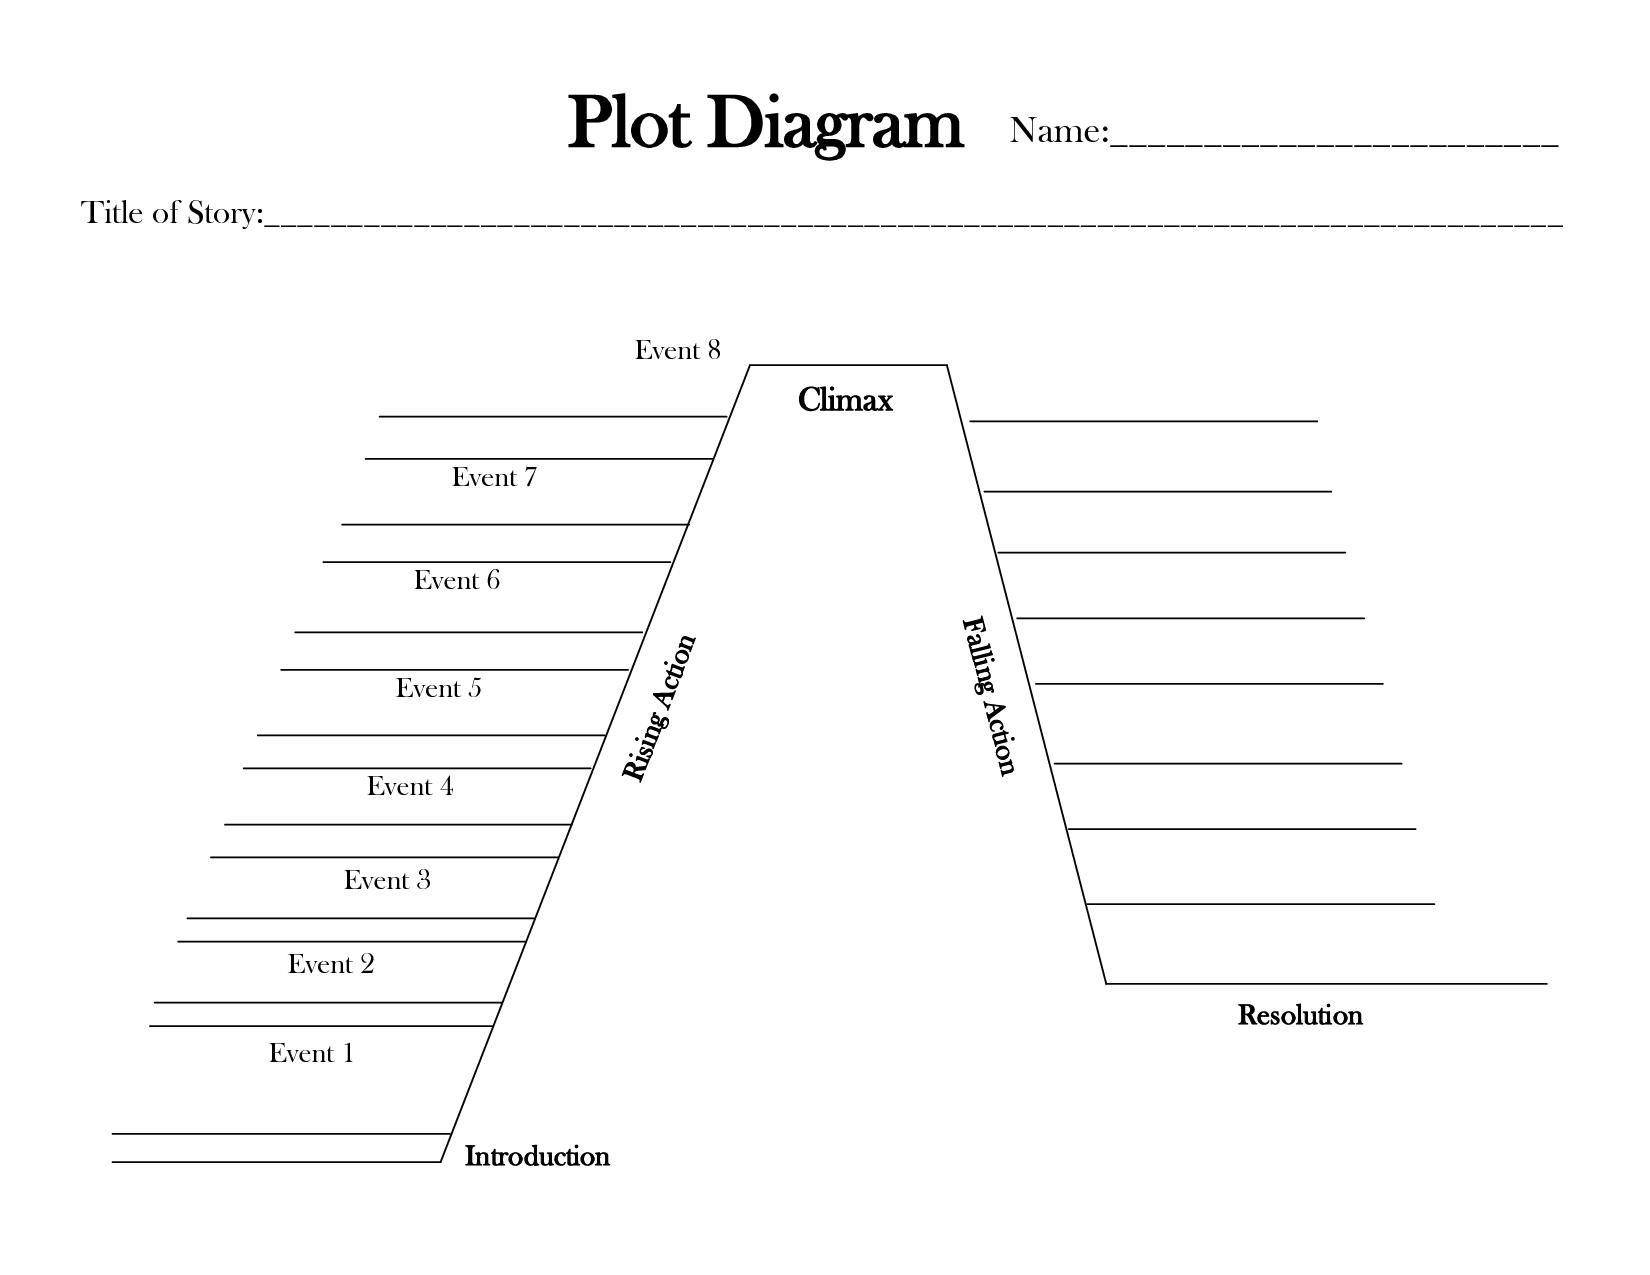 Plot Diagram Name